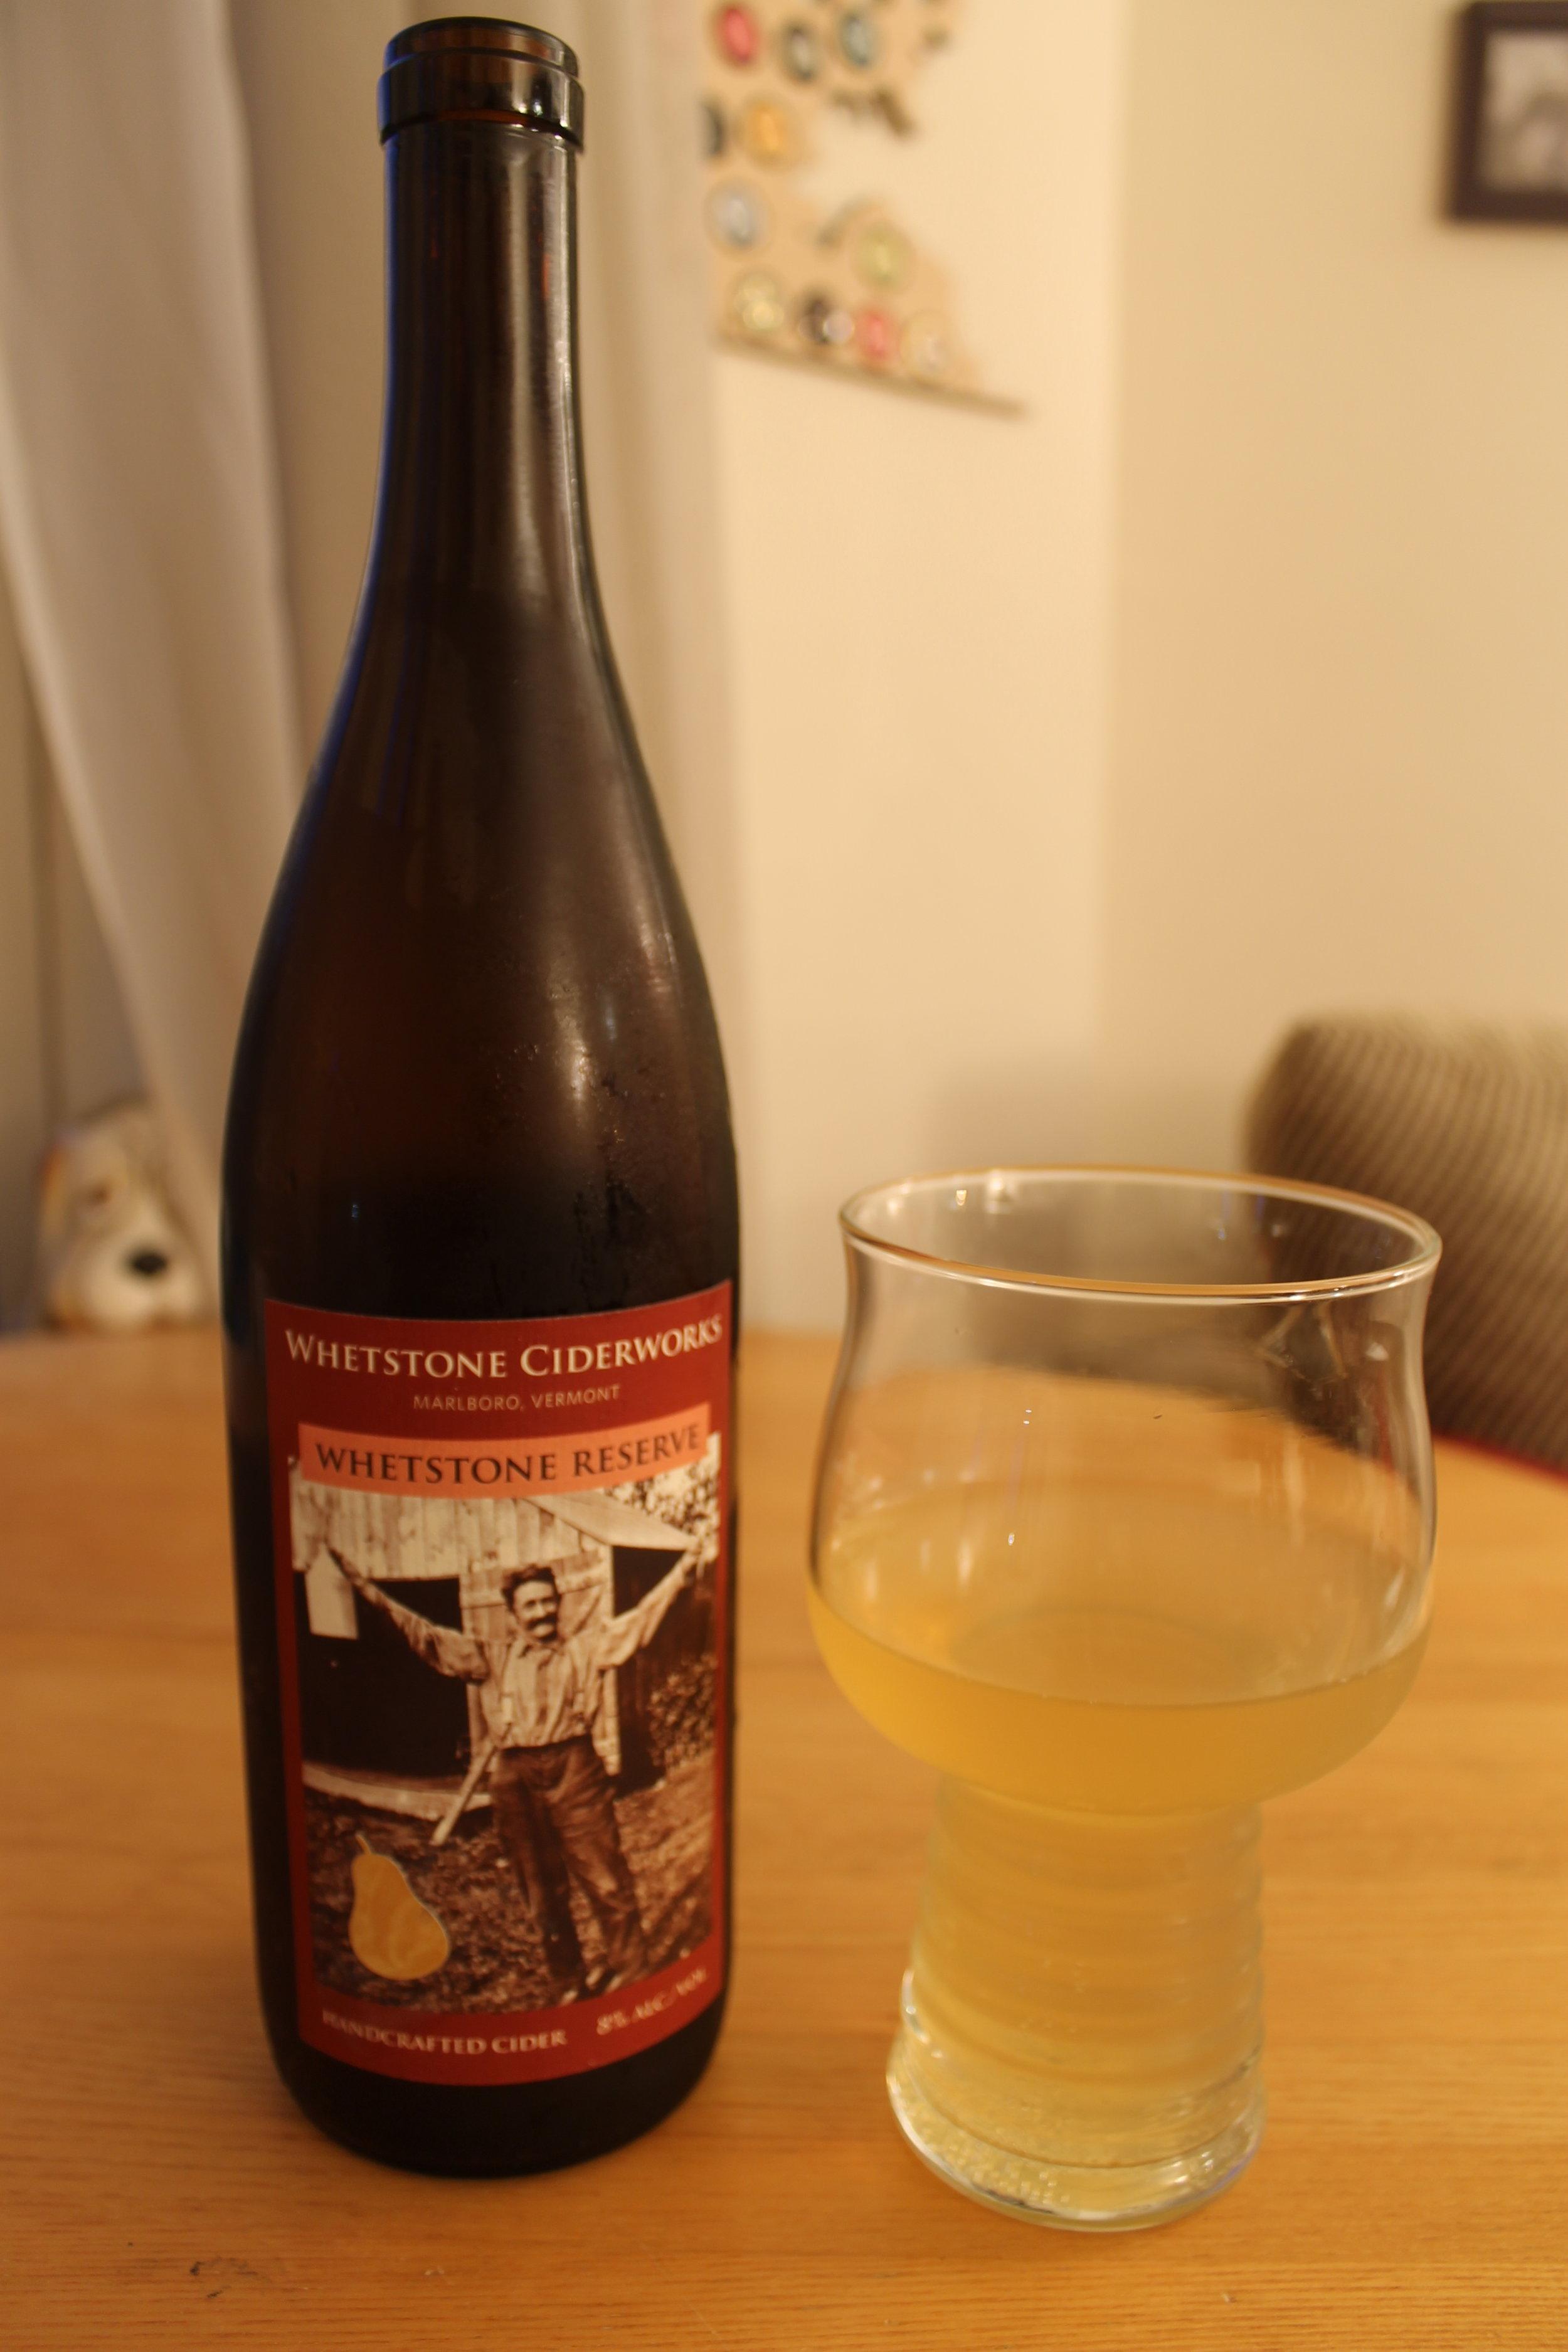 Whetstone Ciderworks: Whetstone Reserve Perry